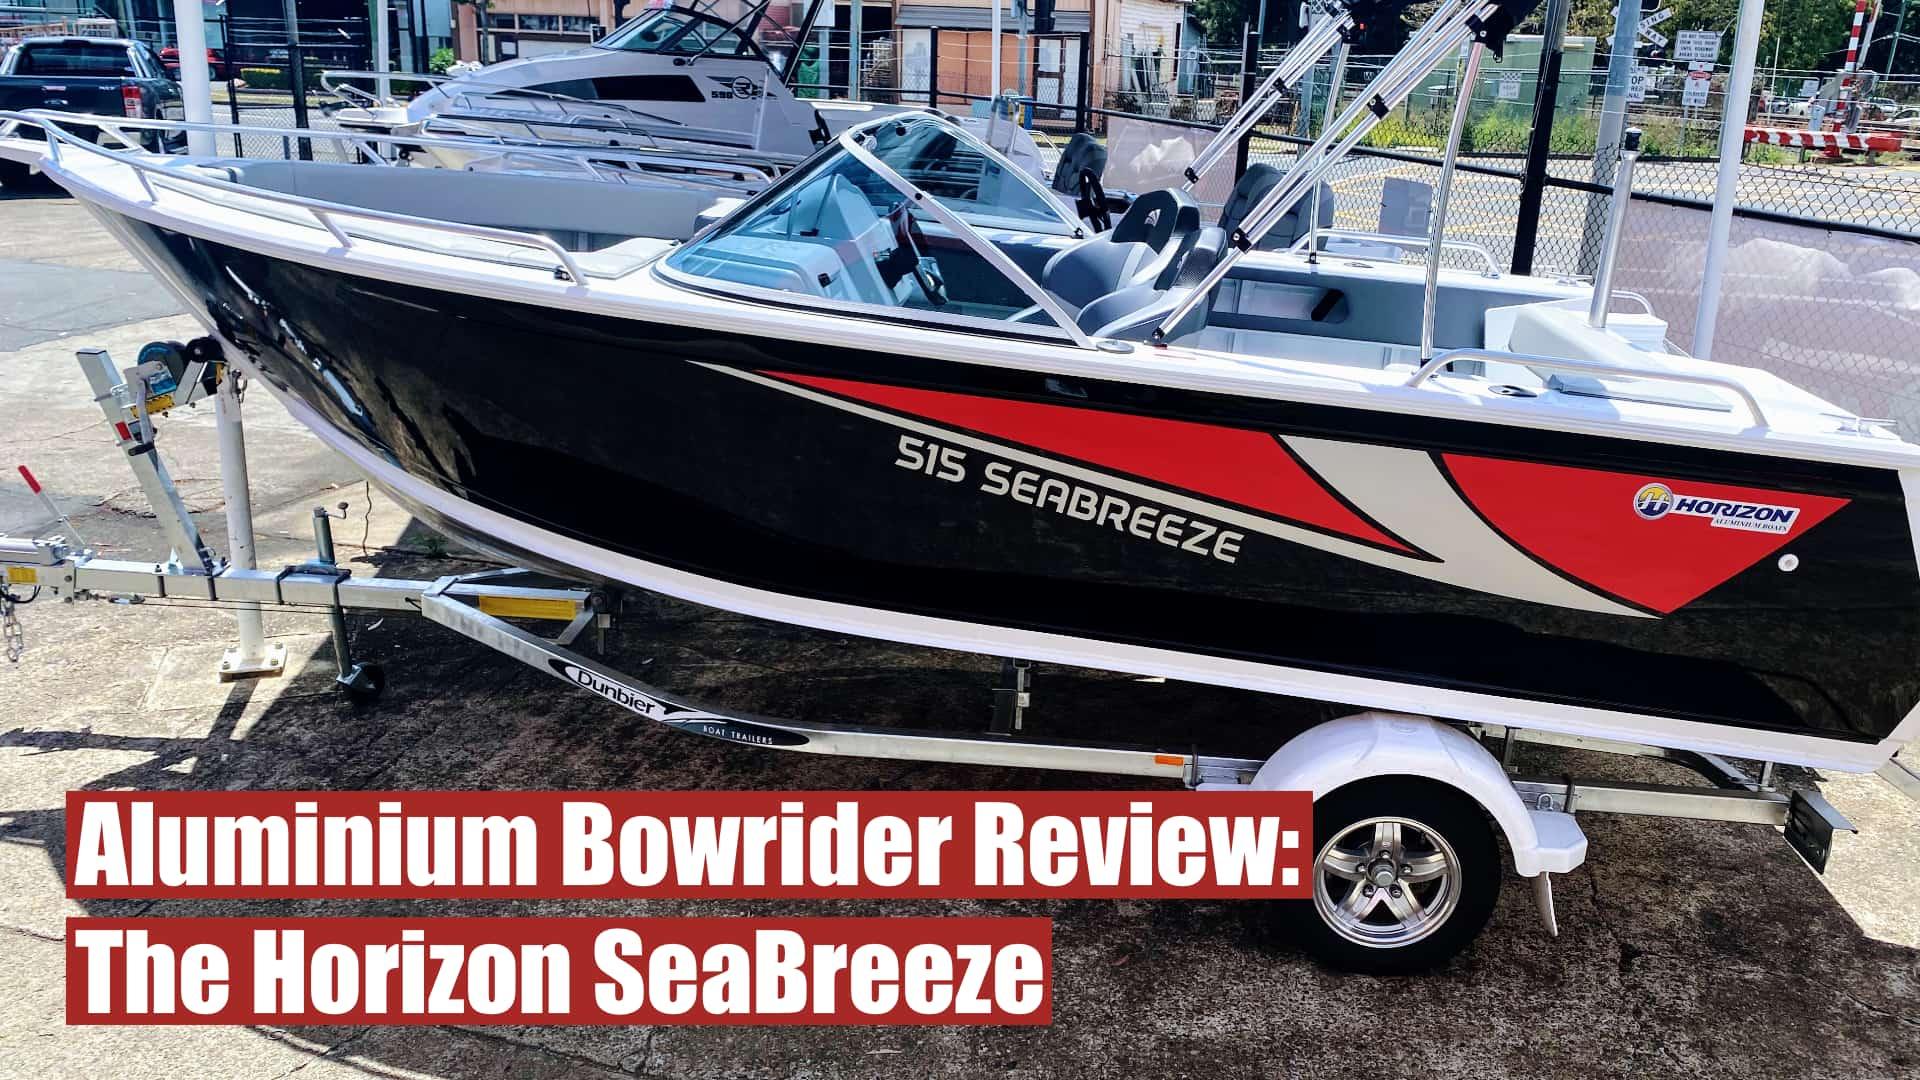 Aluminium bowrider review: the Horizon SeaBreeze